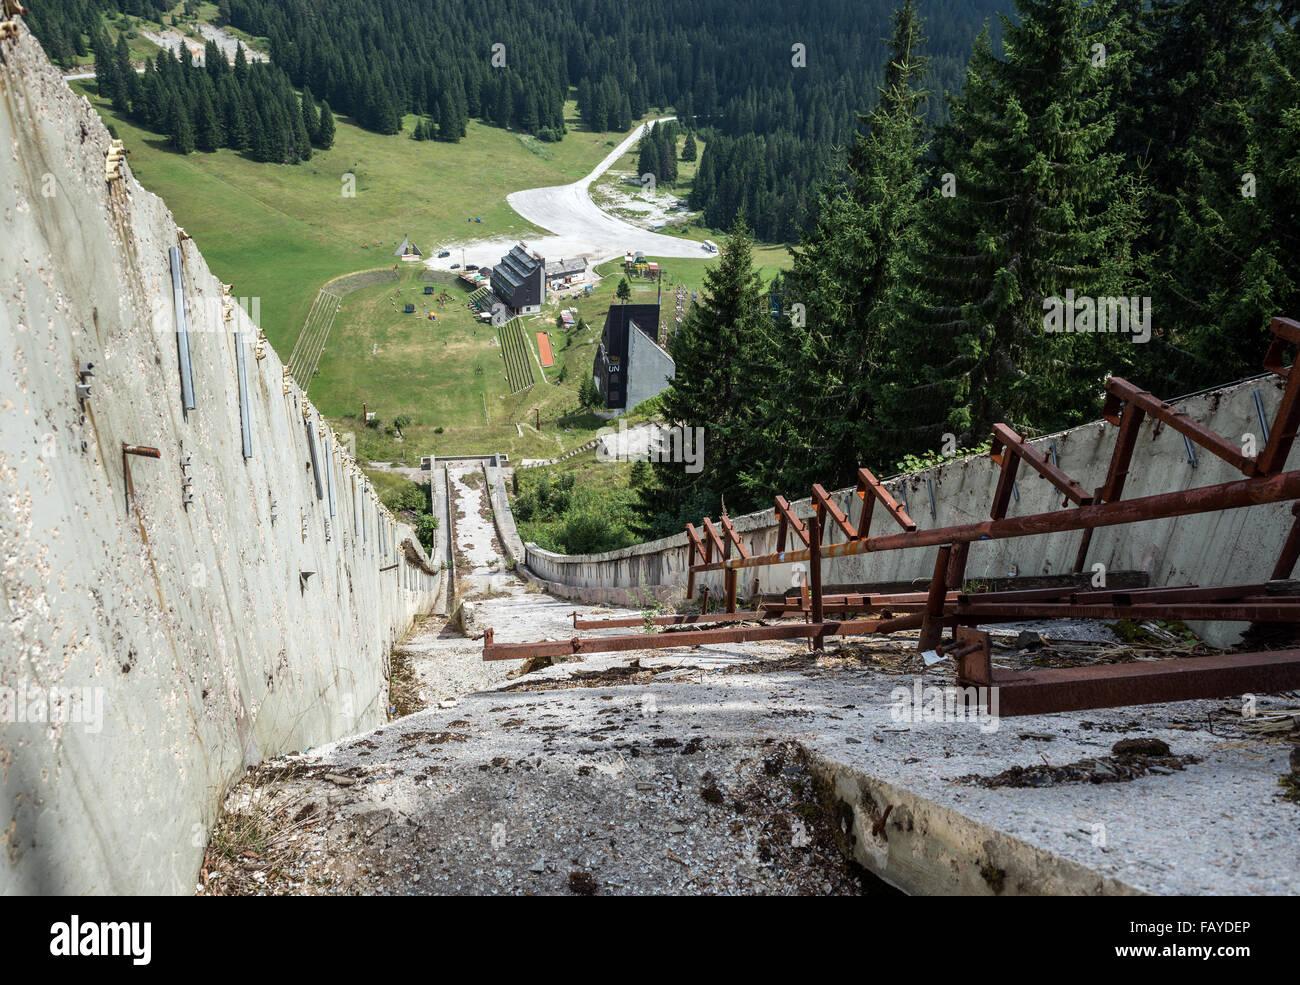 Igman Olympic Springt Auch Genannt Malo Polje In Ilid A